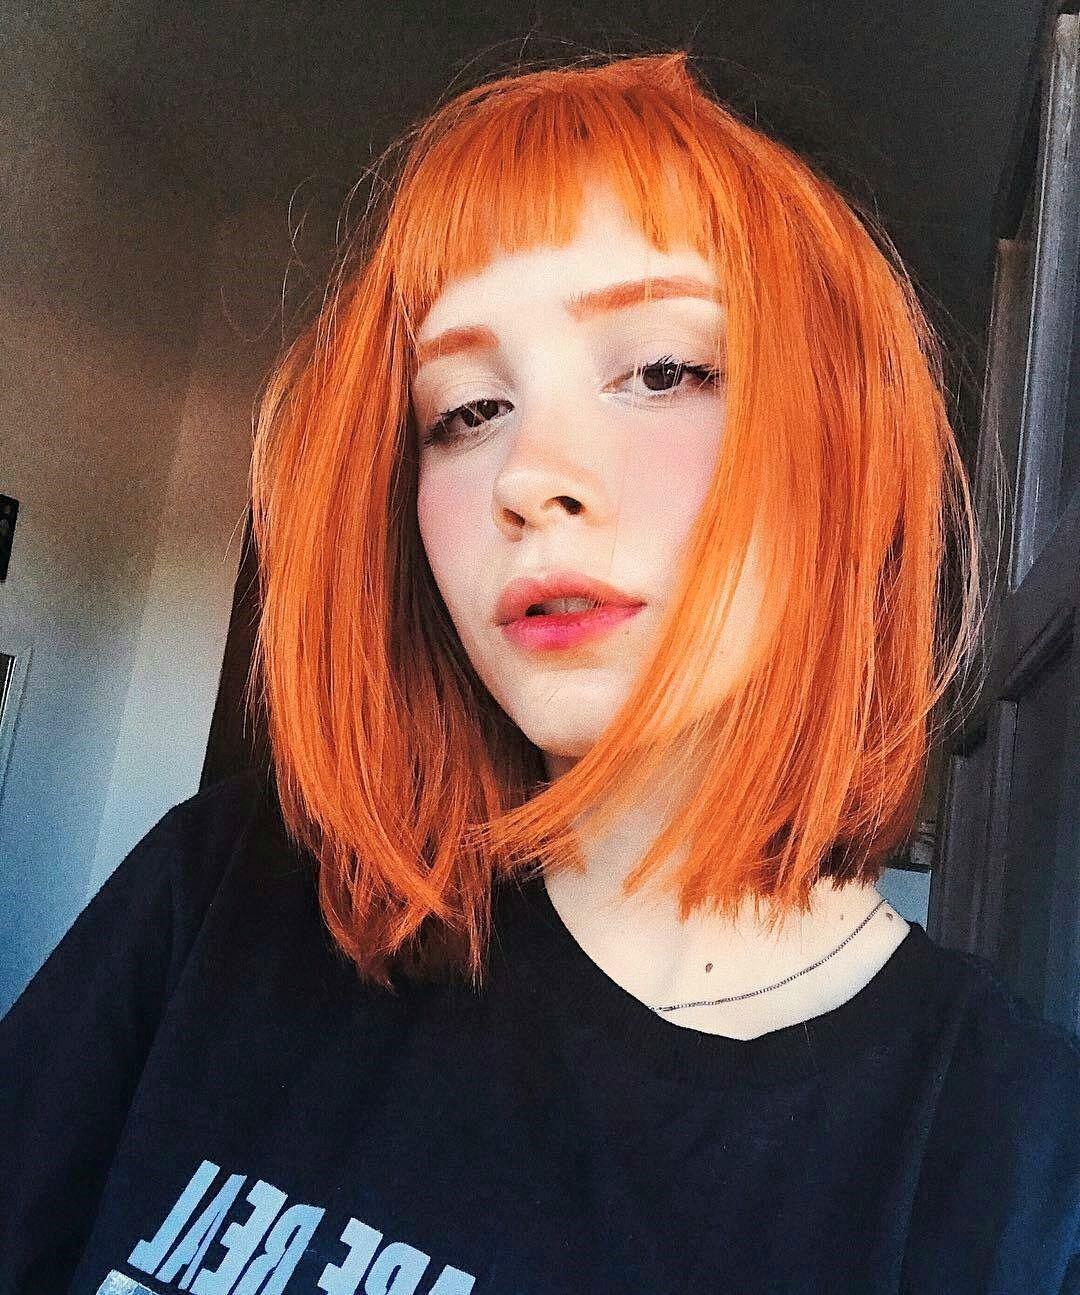 Pin By Seph On Belle Et Beau In 2018 Pinterest Hair Styles Hair